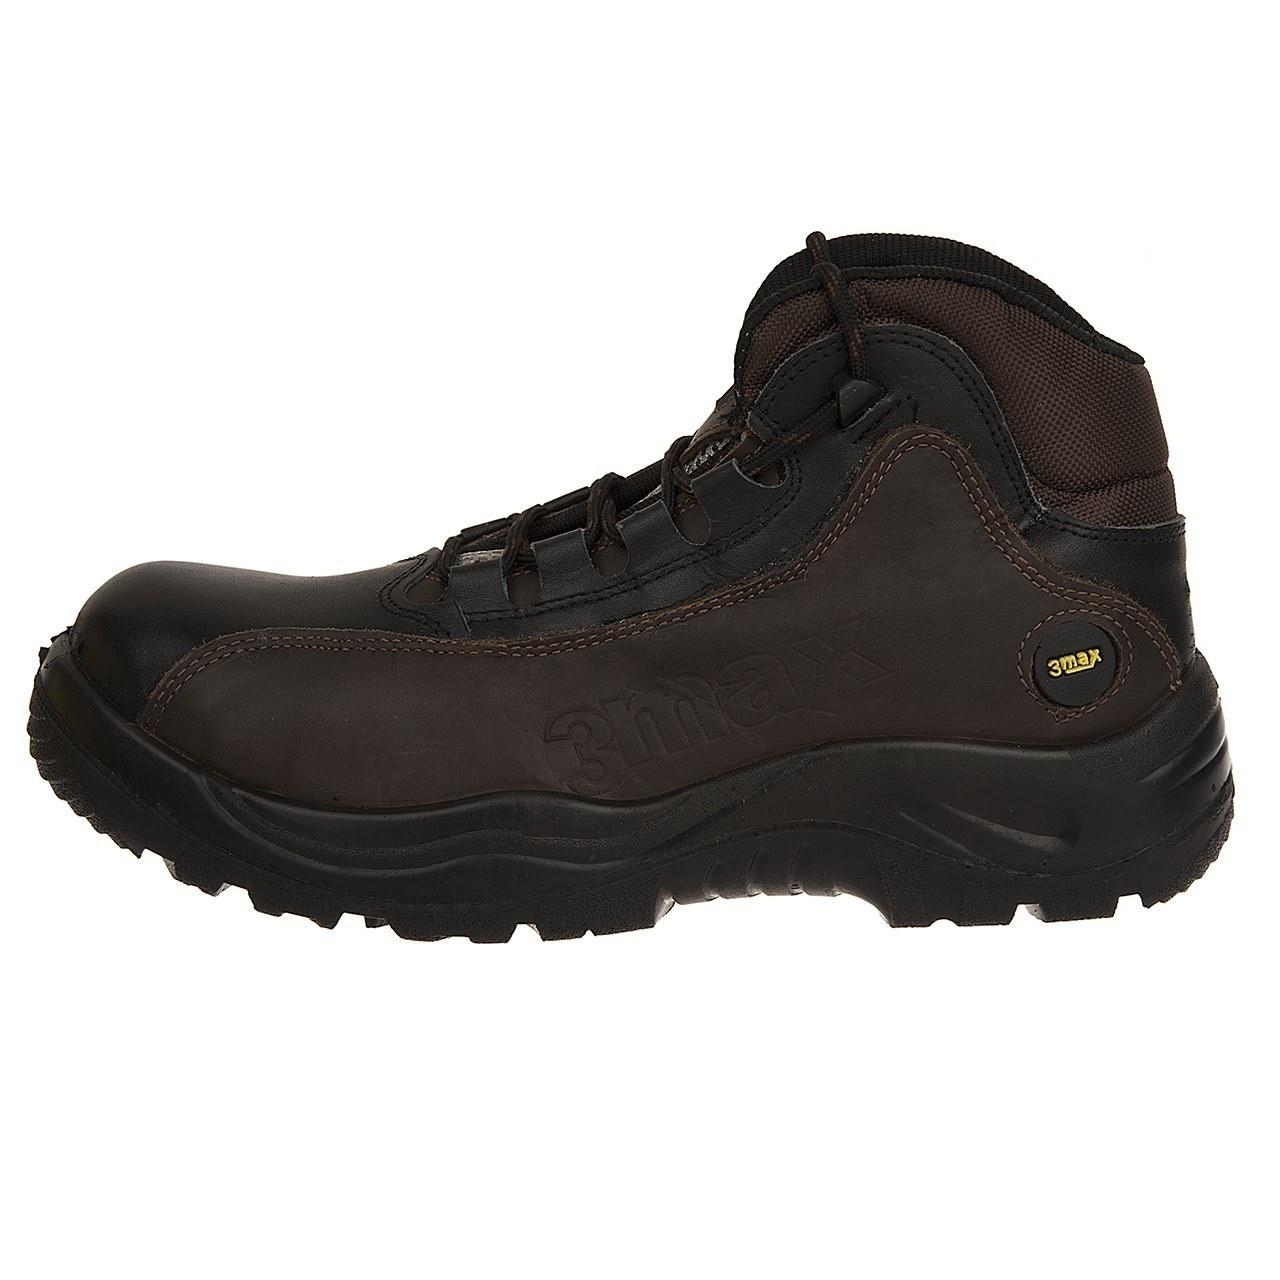 عکس کفش ايمني 3 مکس  کفش-ایمنی-3-مکس